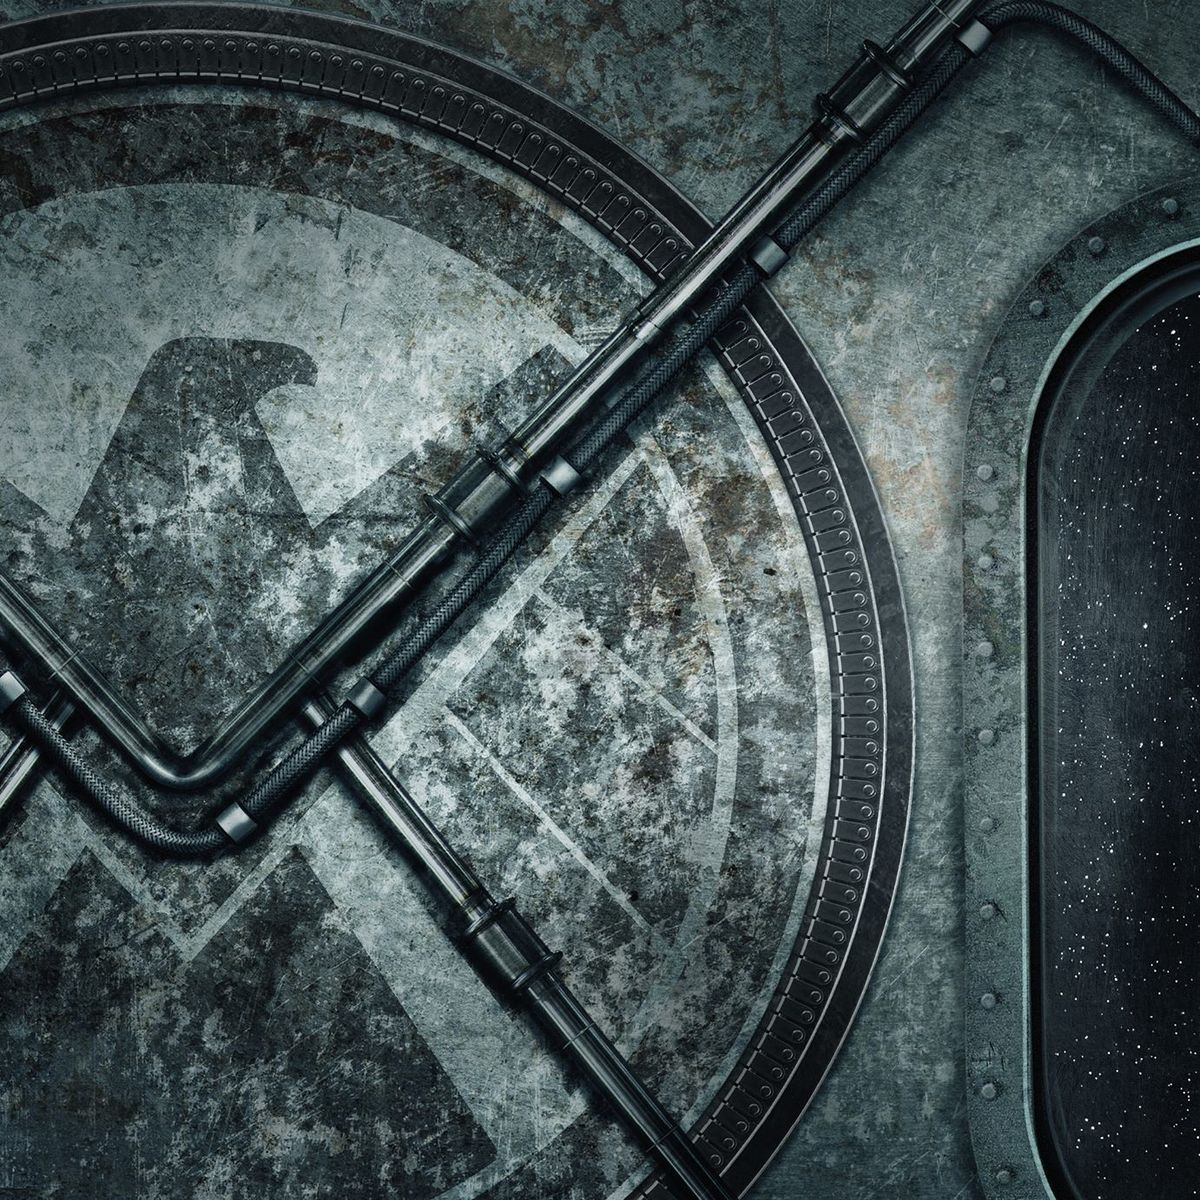 shield-season5-poster.jpg